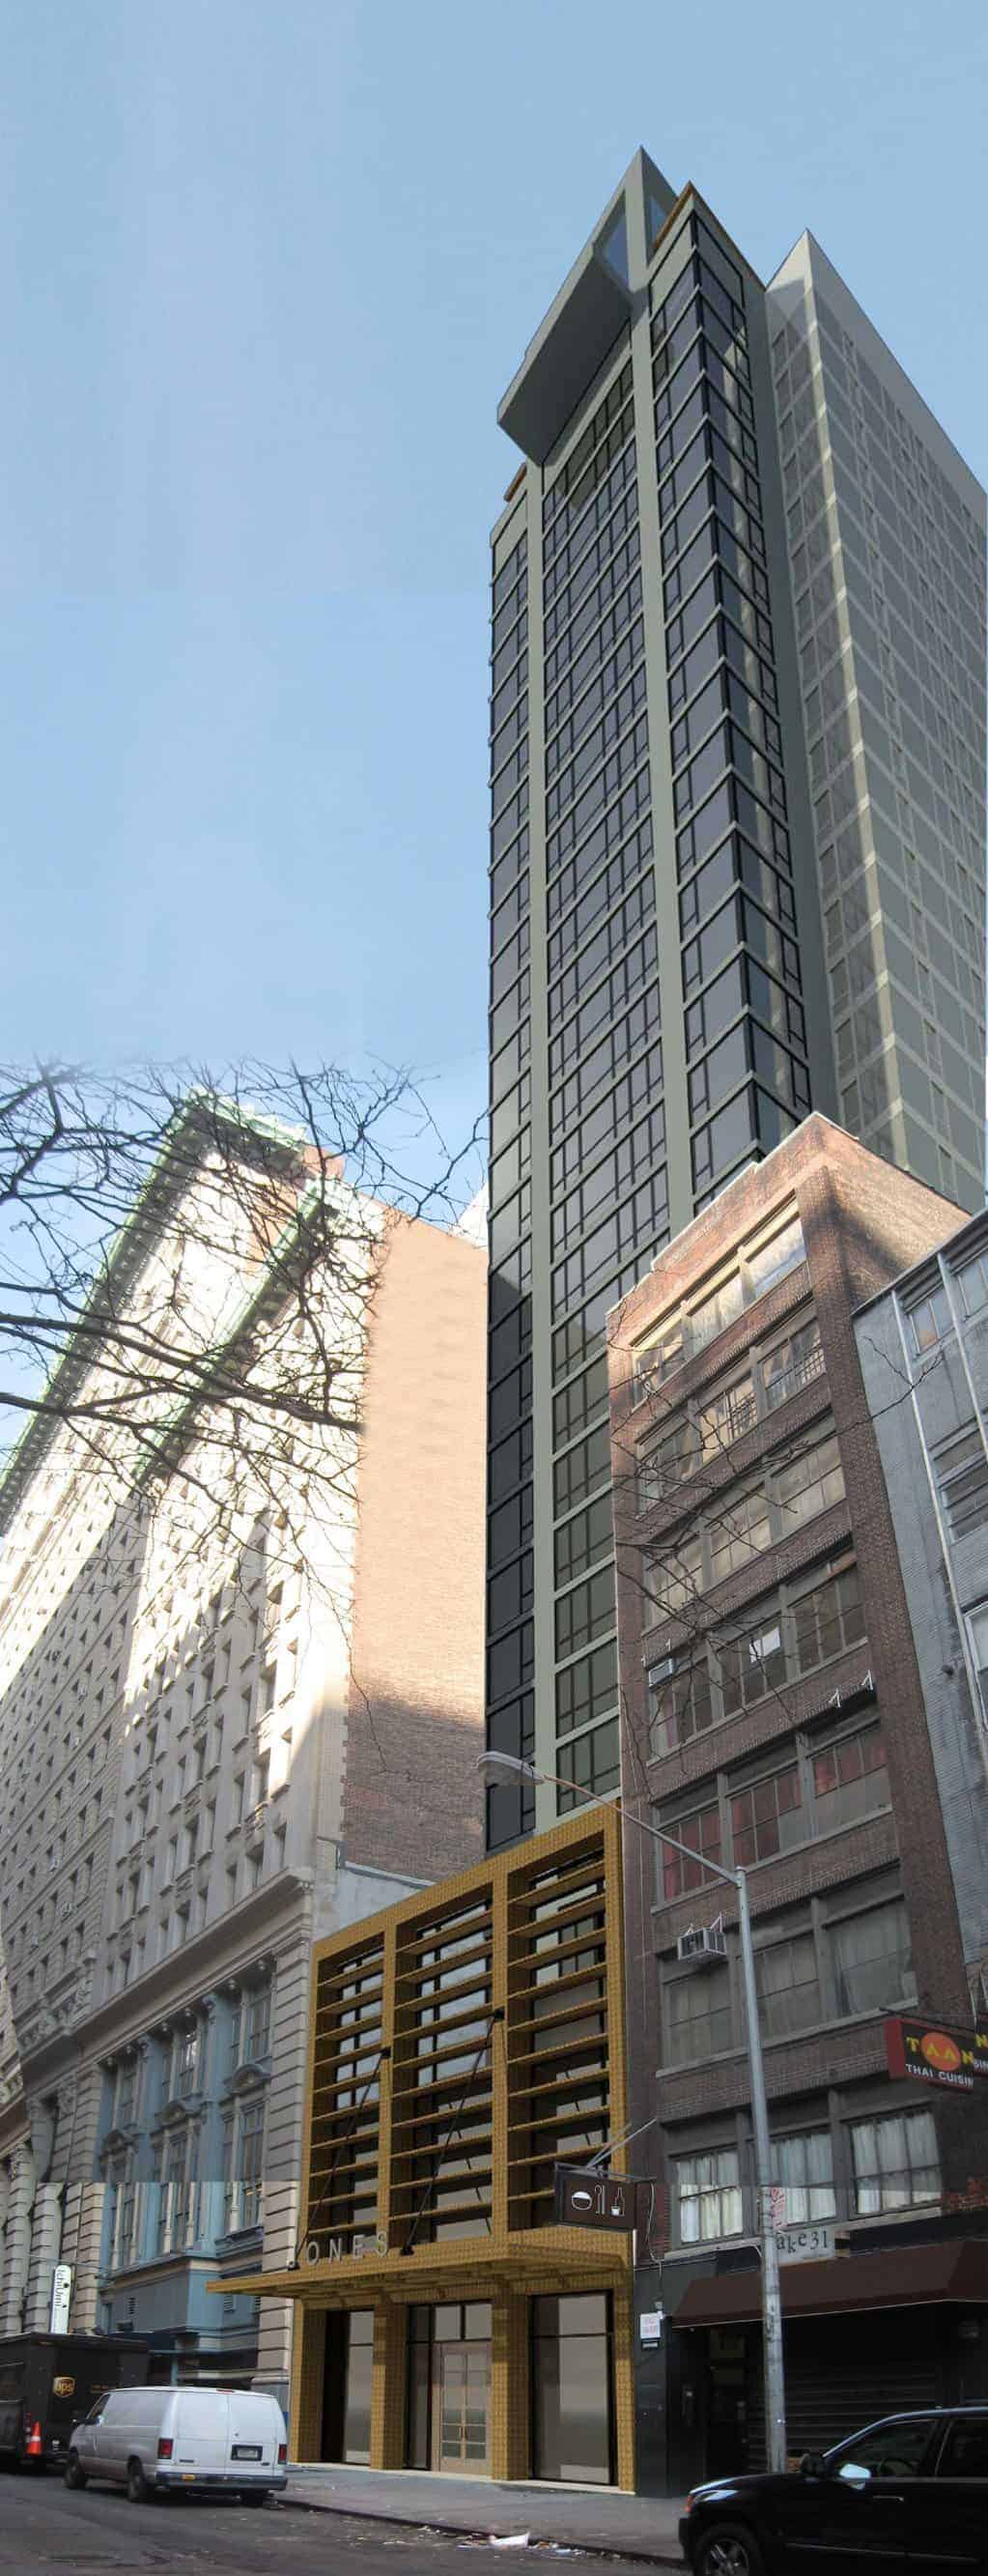 11 east 31st street gwathmey siegel kaufman for 11 east broadway 13th floor new york ny 10038